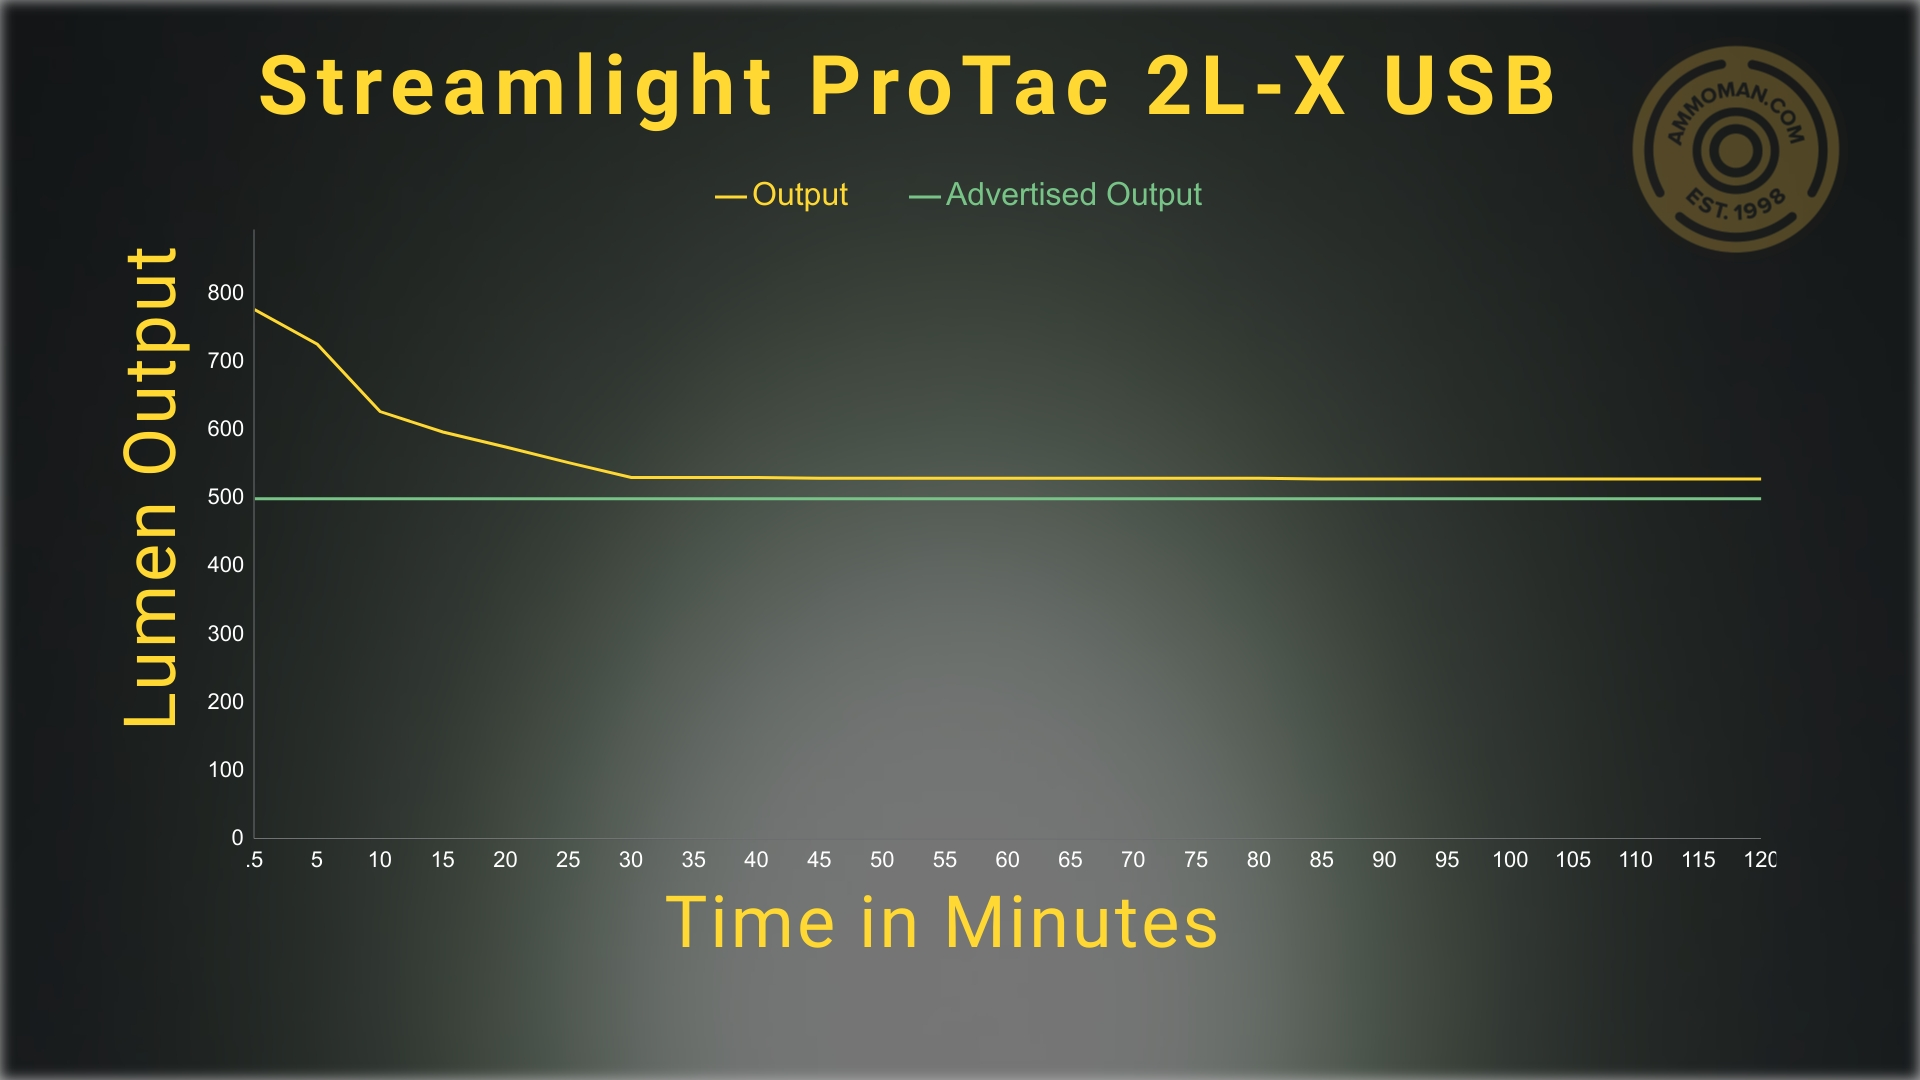 lumen testing results for the ProTAC 2L-X flashlight